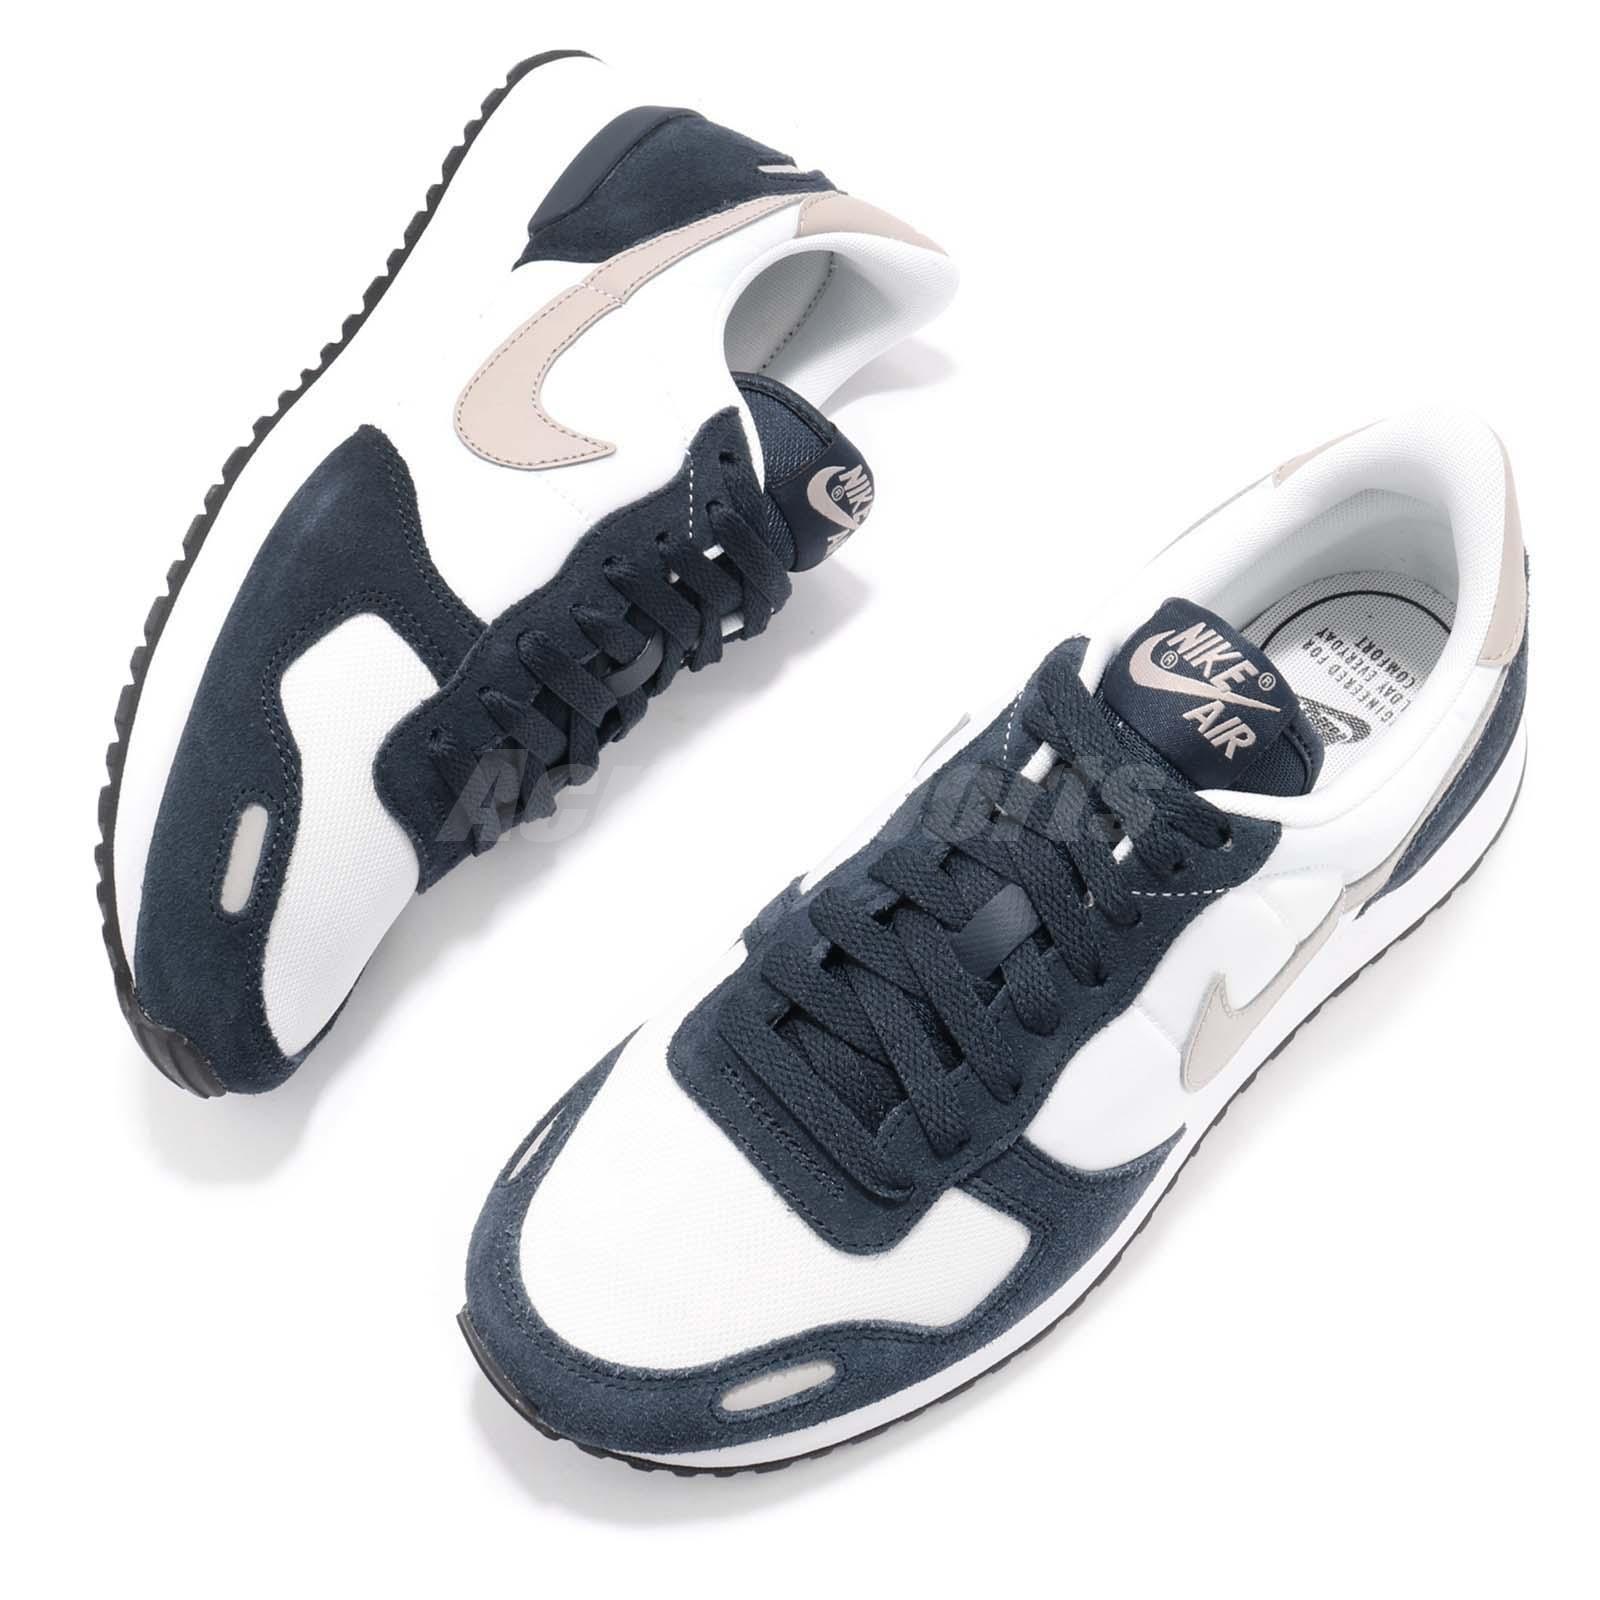 c93b7a28bca7 Nike Air Vrtx Vortex Armory Navy Cobblestone White Men Running Shoes ...